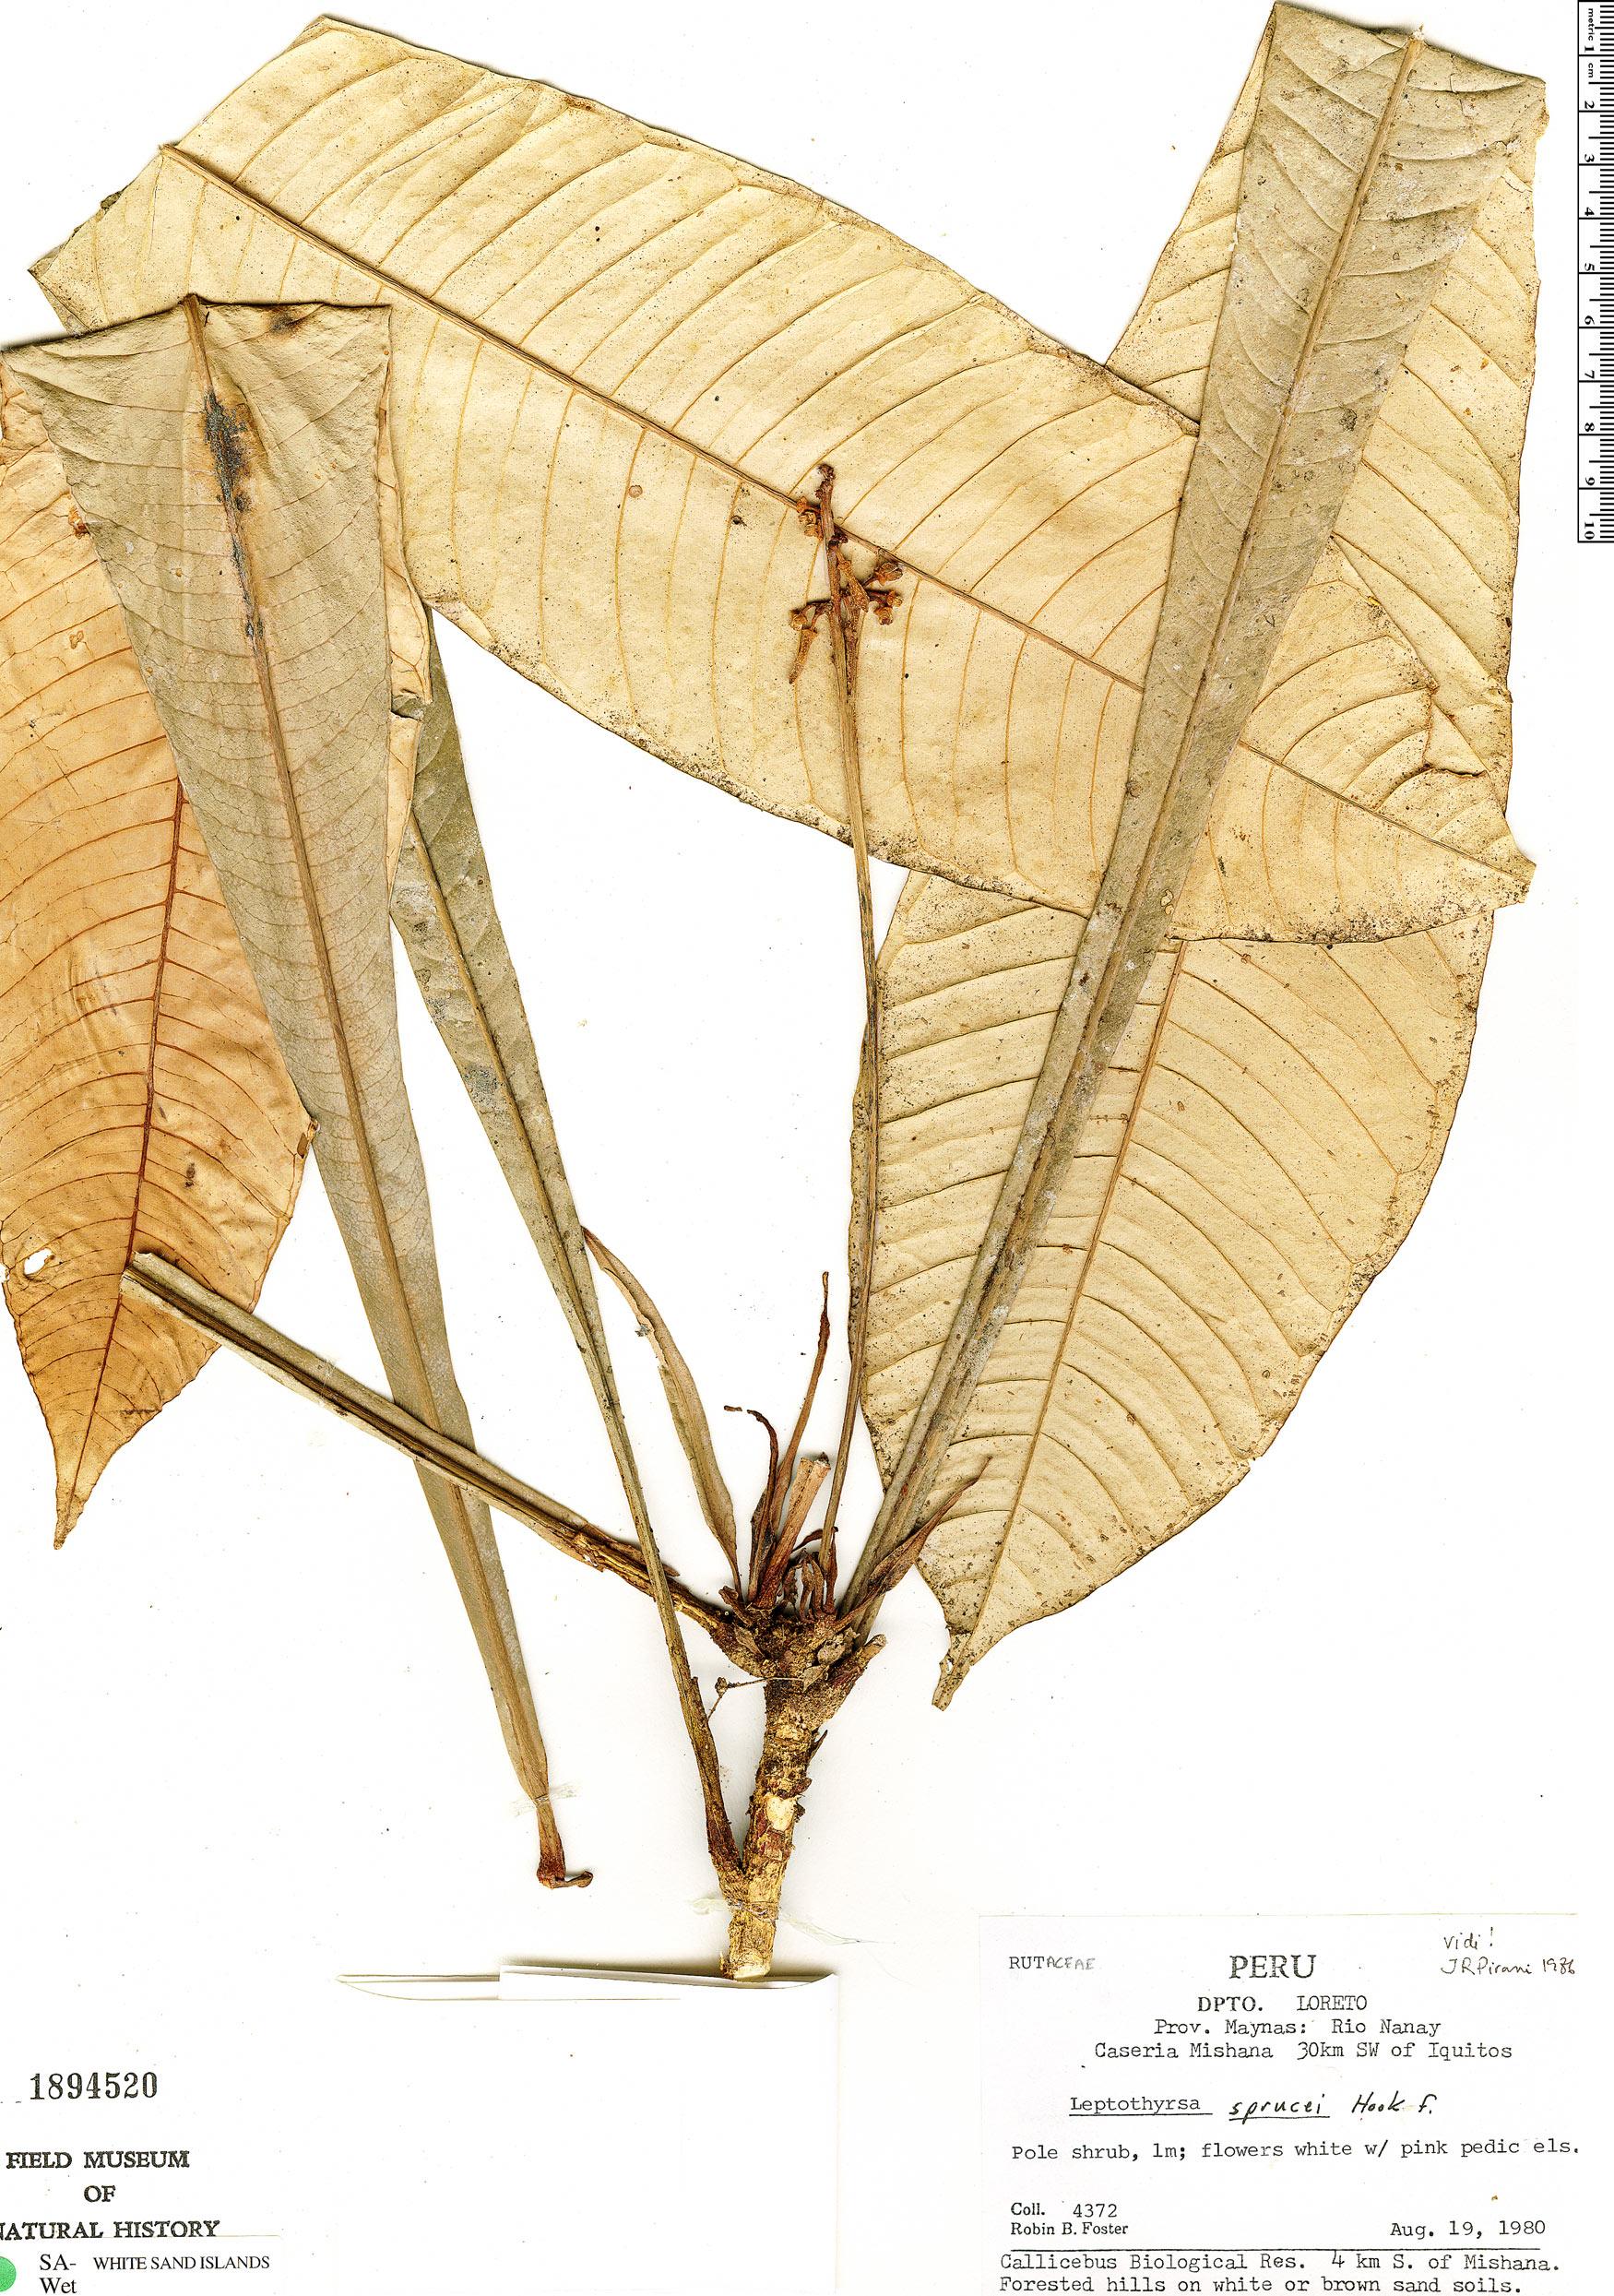 Espécime: Leptothyrsa sprucei